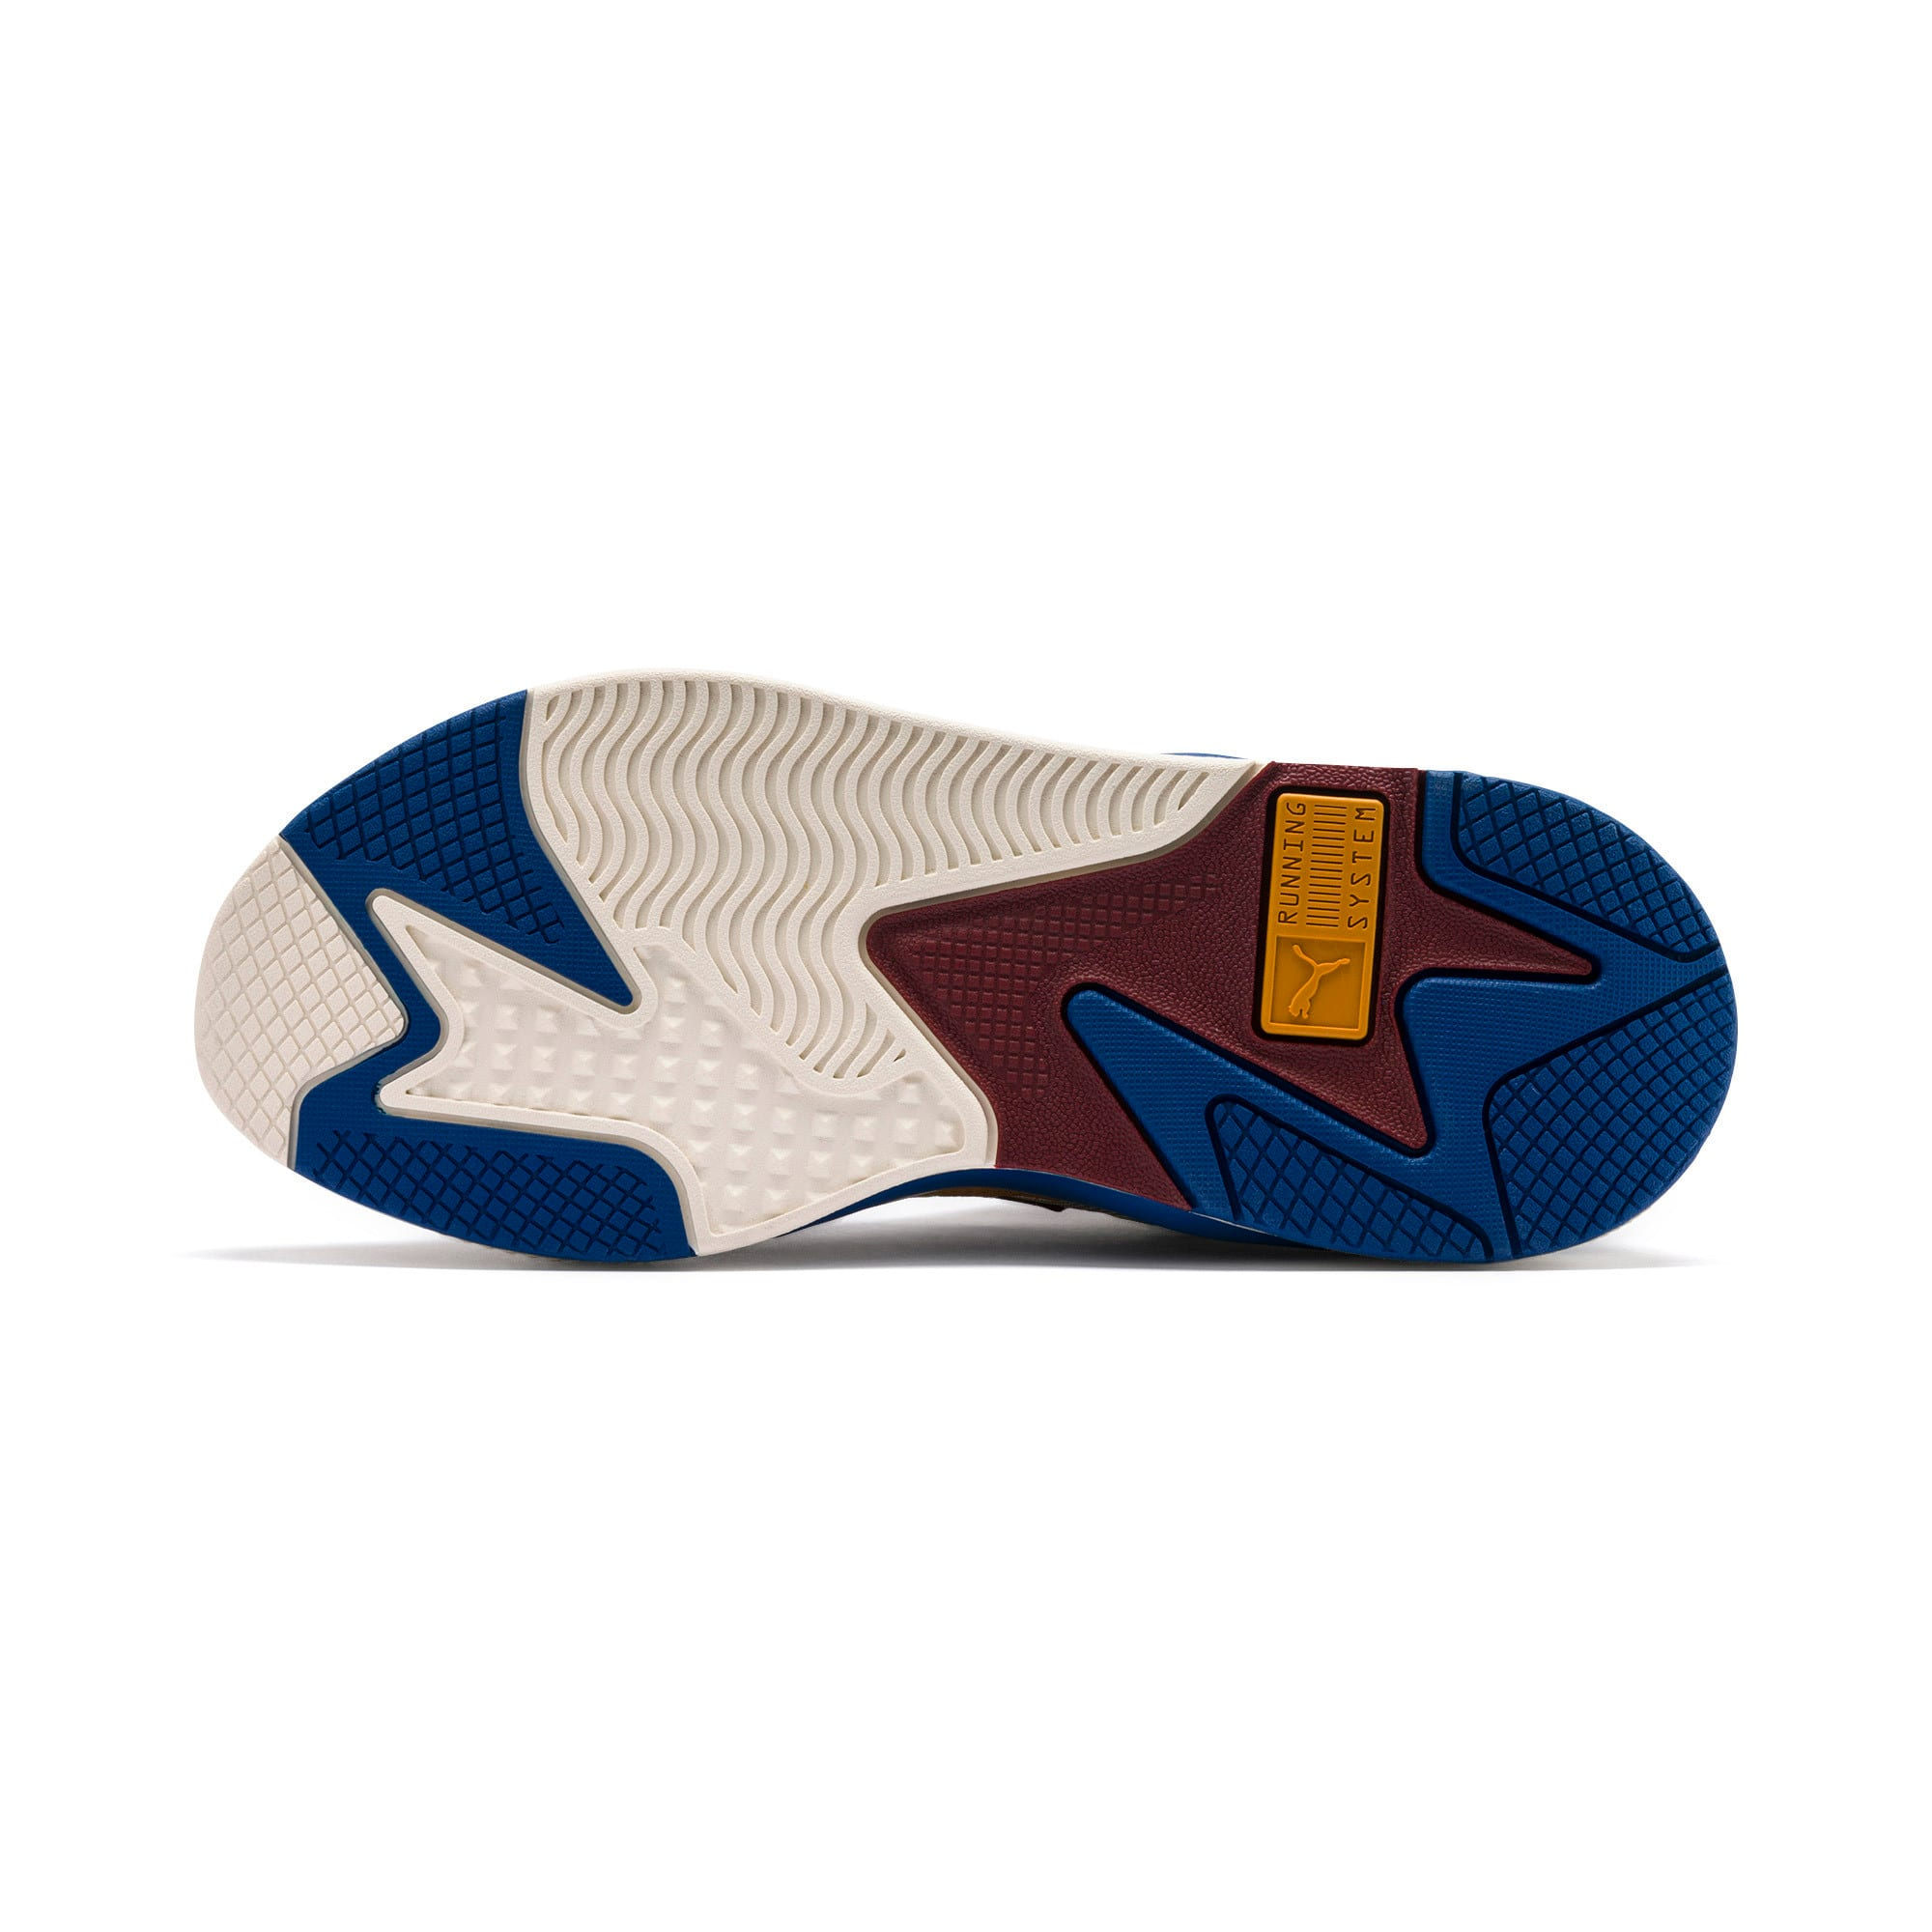 Thumbnail 6 of PUMA x TYAKASHA RS-X Sneakers, Whisper White-Fired Brick, medium